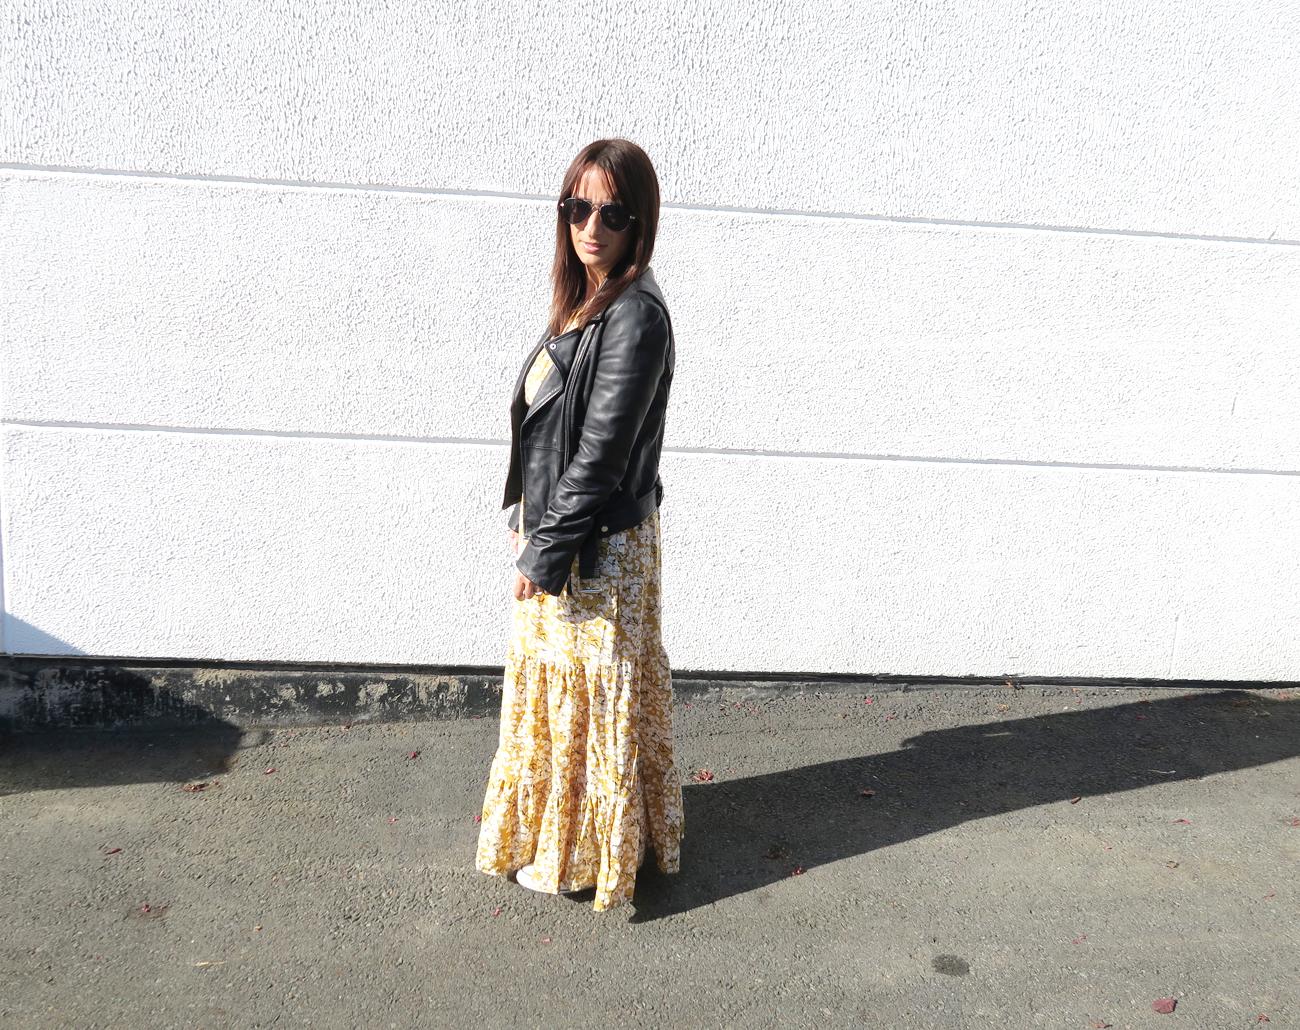 dressfo-kleid-modeblogger-fashionblogger-blogger-style-fashion-modesalat-streetstyle-6